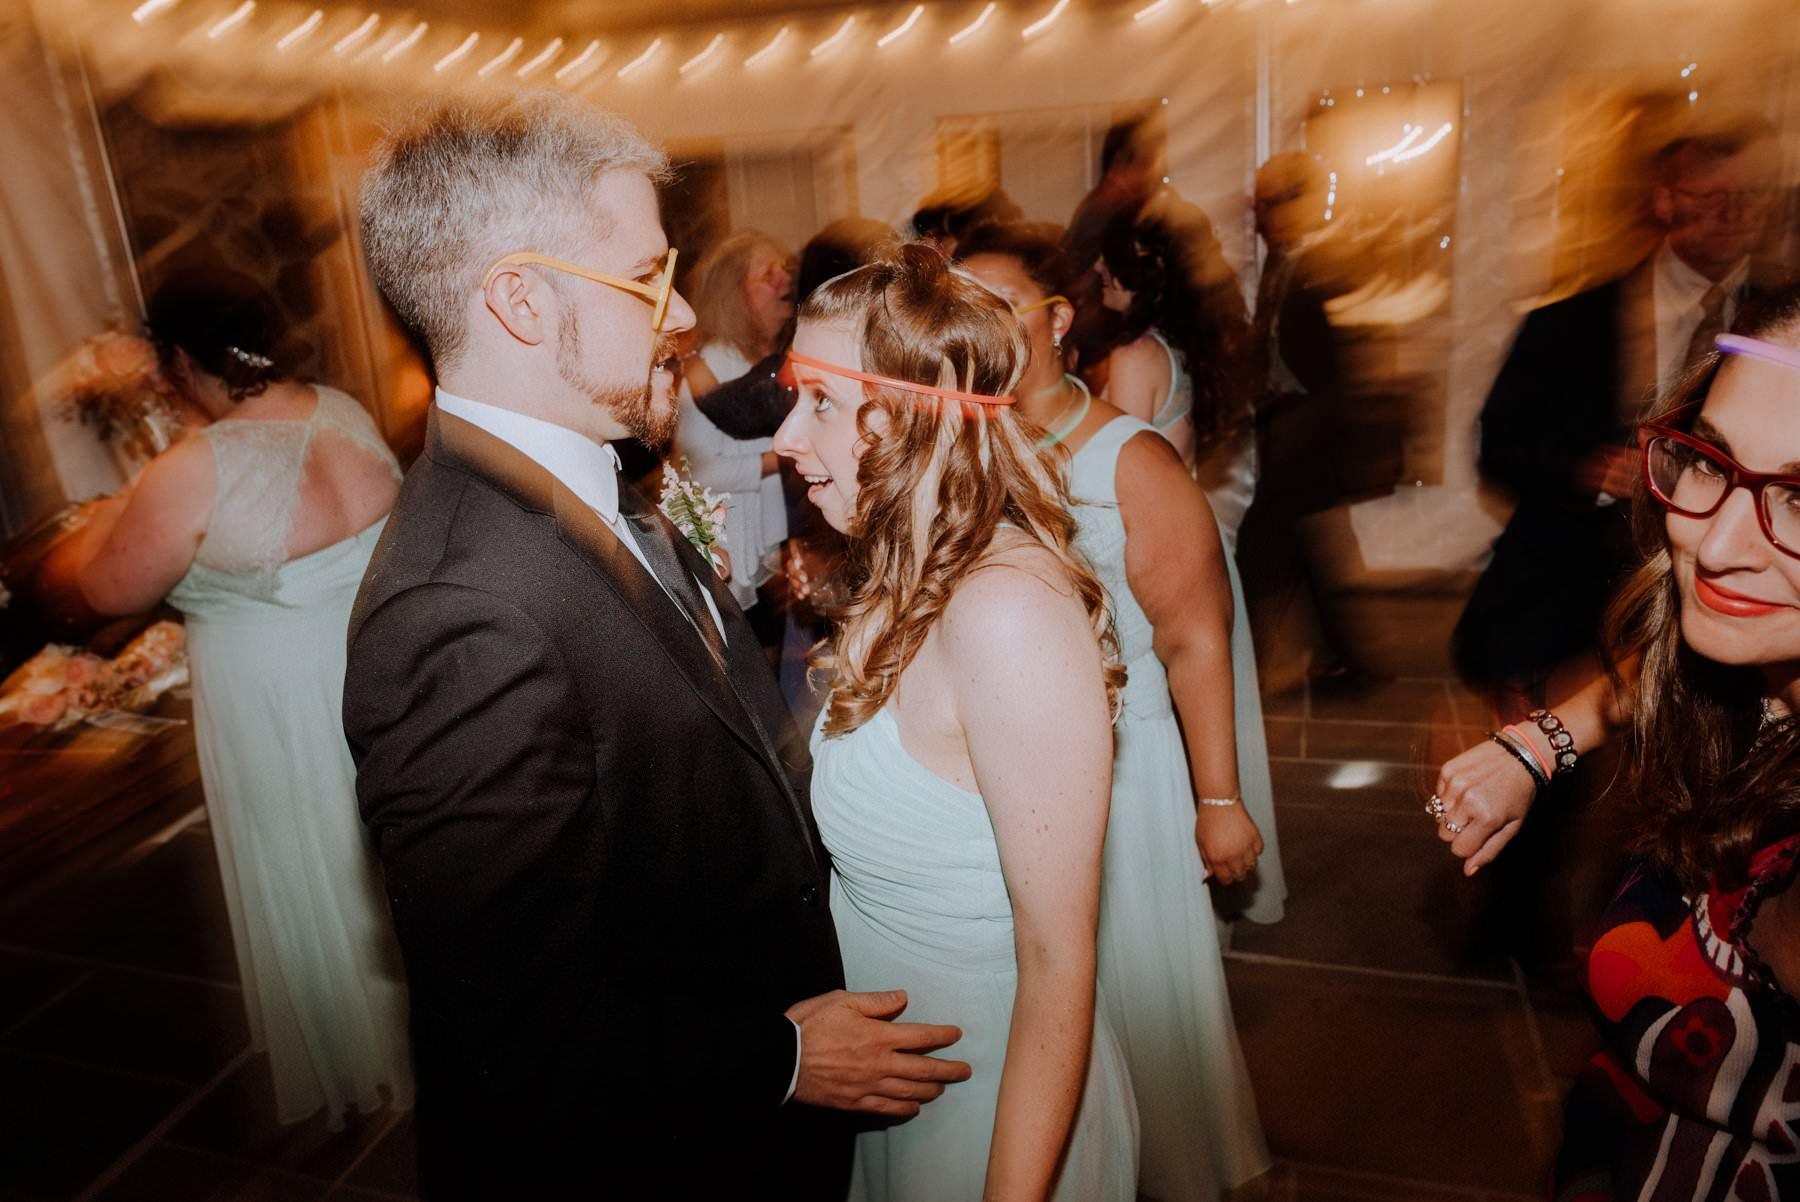 welkinweir-wedding-photography-60.jpg